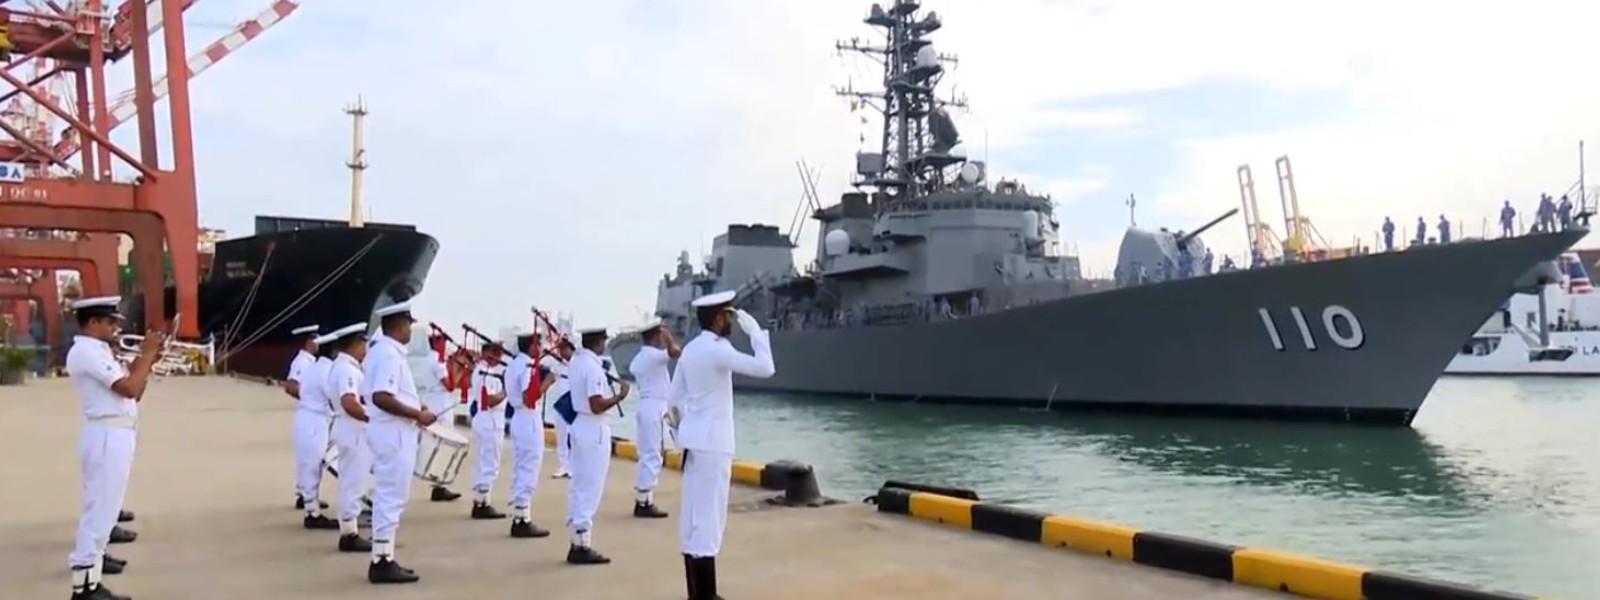 JMSDF Takanami arrives at the Colombo Port